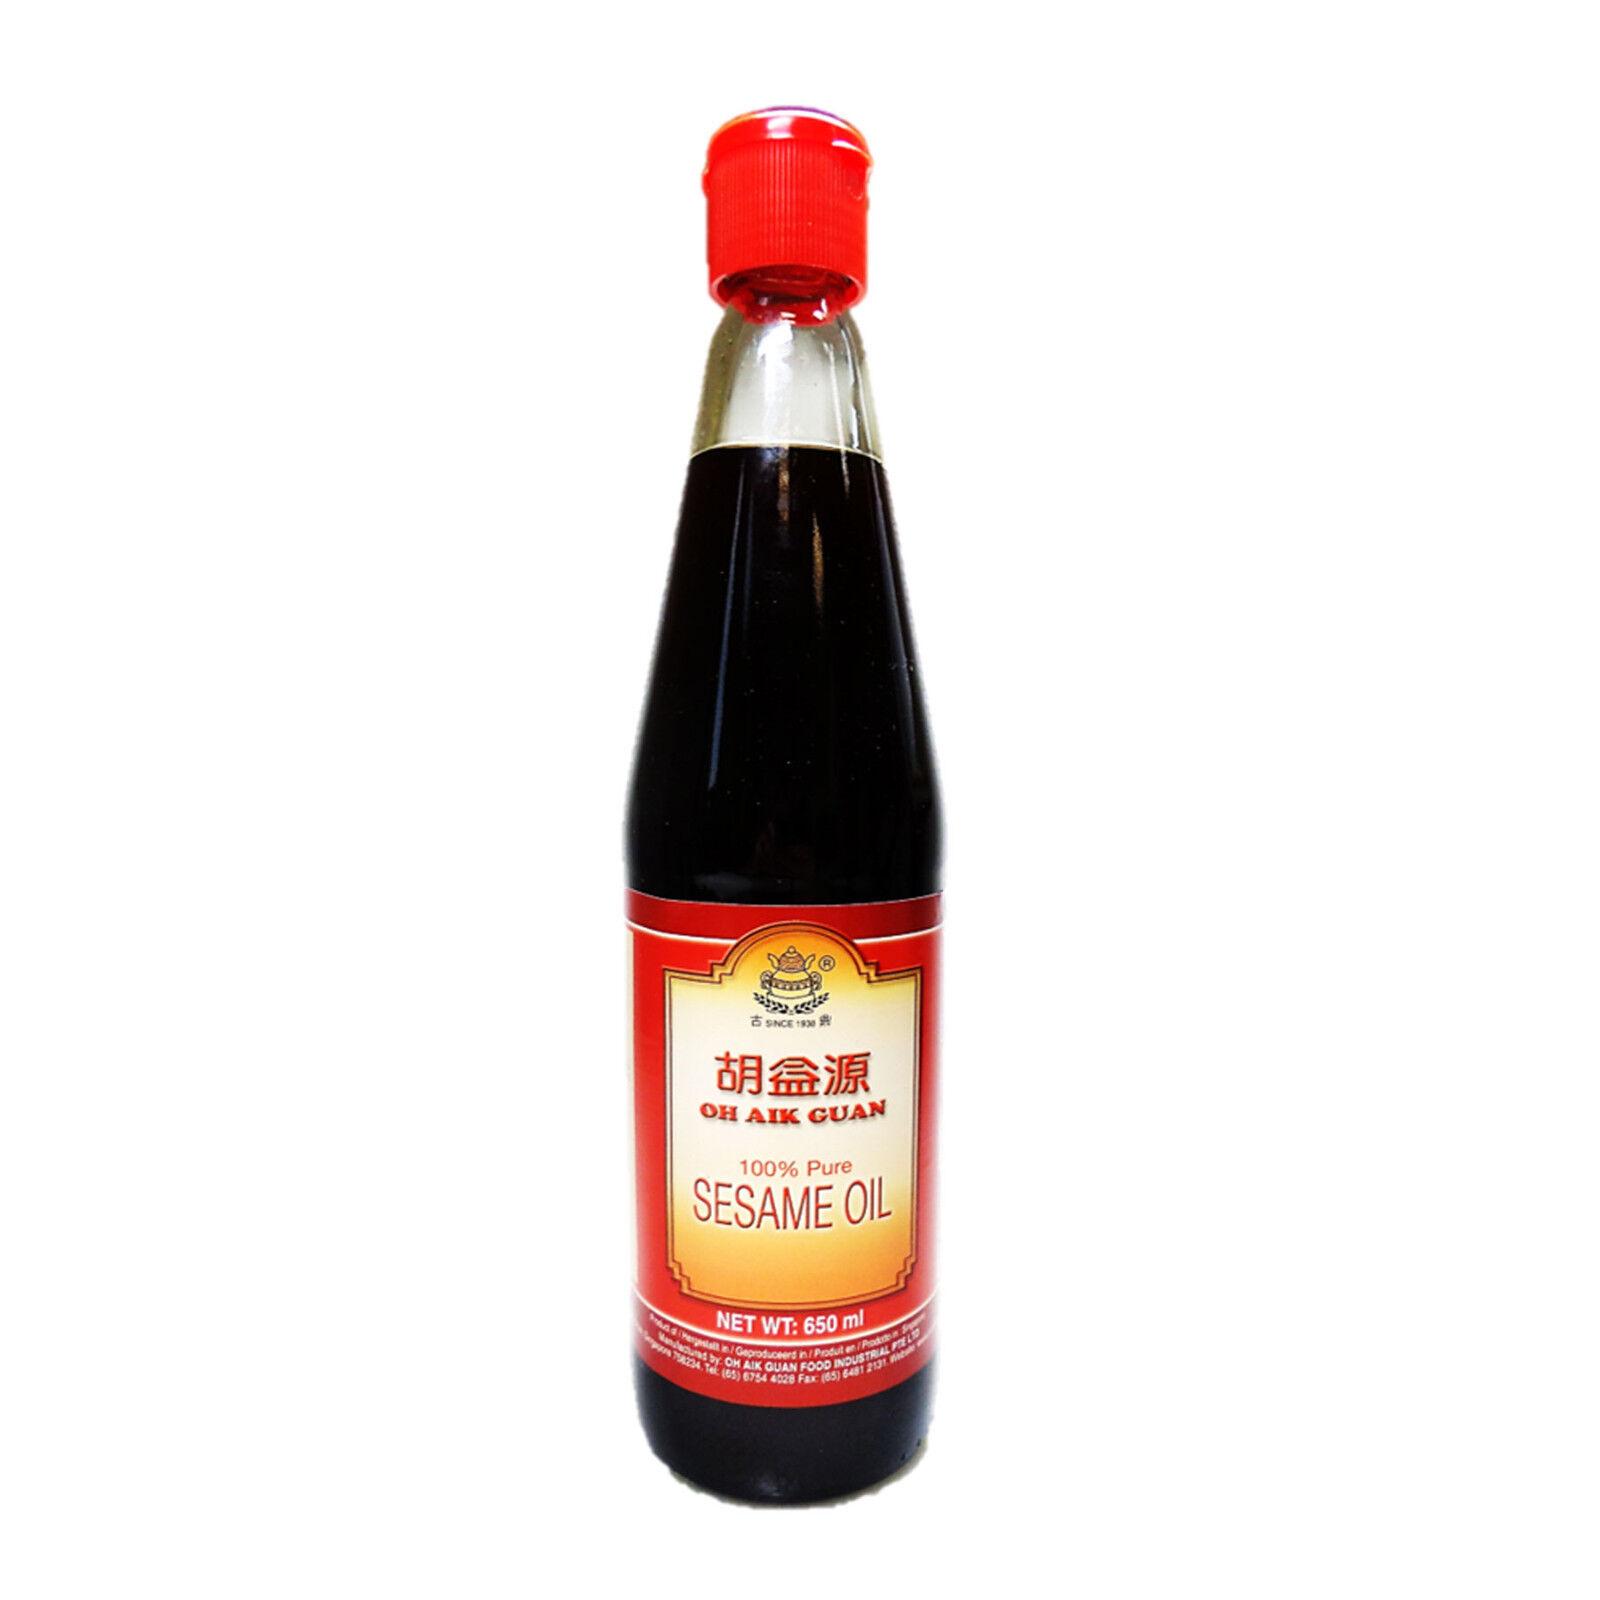 2 x 650ml 100% Sesamöl Sesam Öl aus gerösteten Sesamsamen Oh Aik Guan Sesame Oil